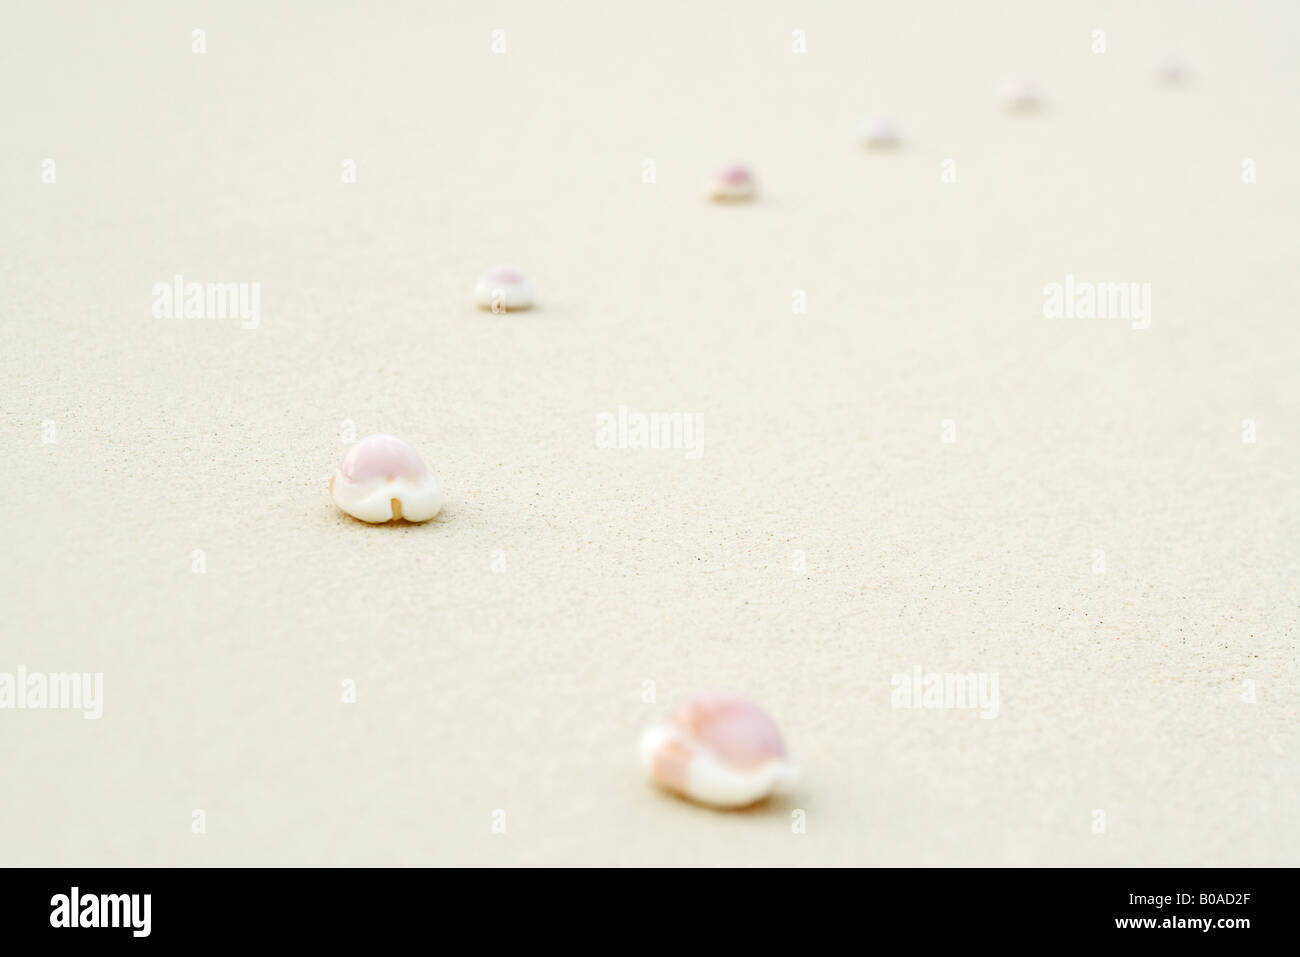 Seashells lined up on sand, close-up - Stock Image